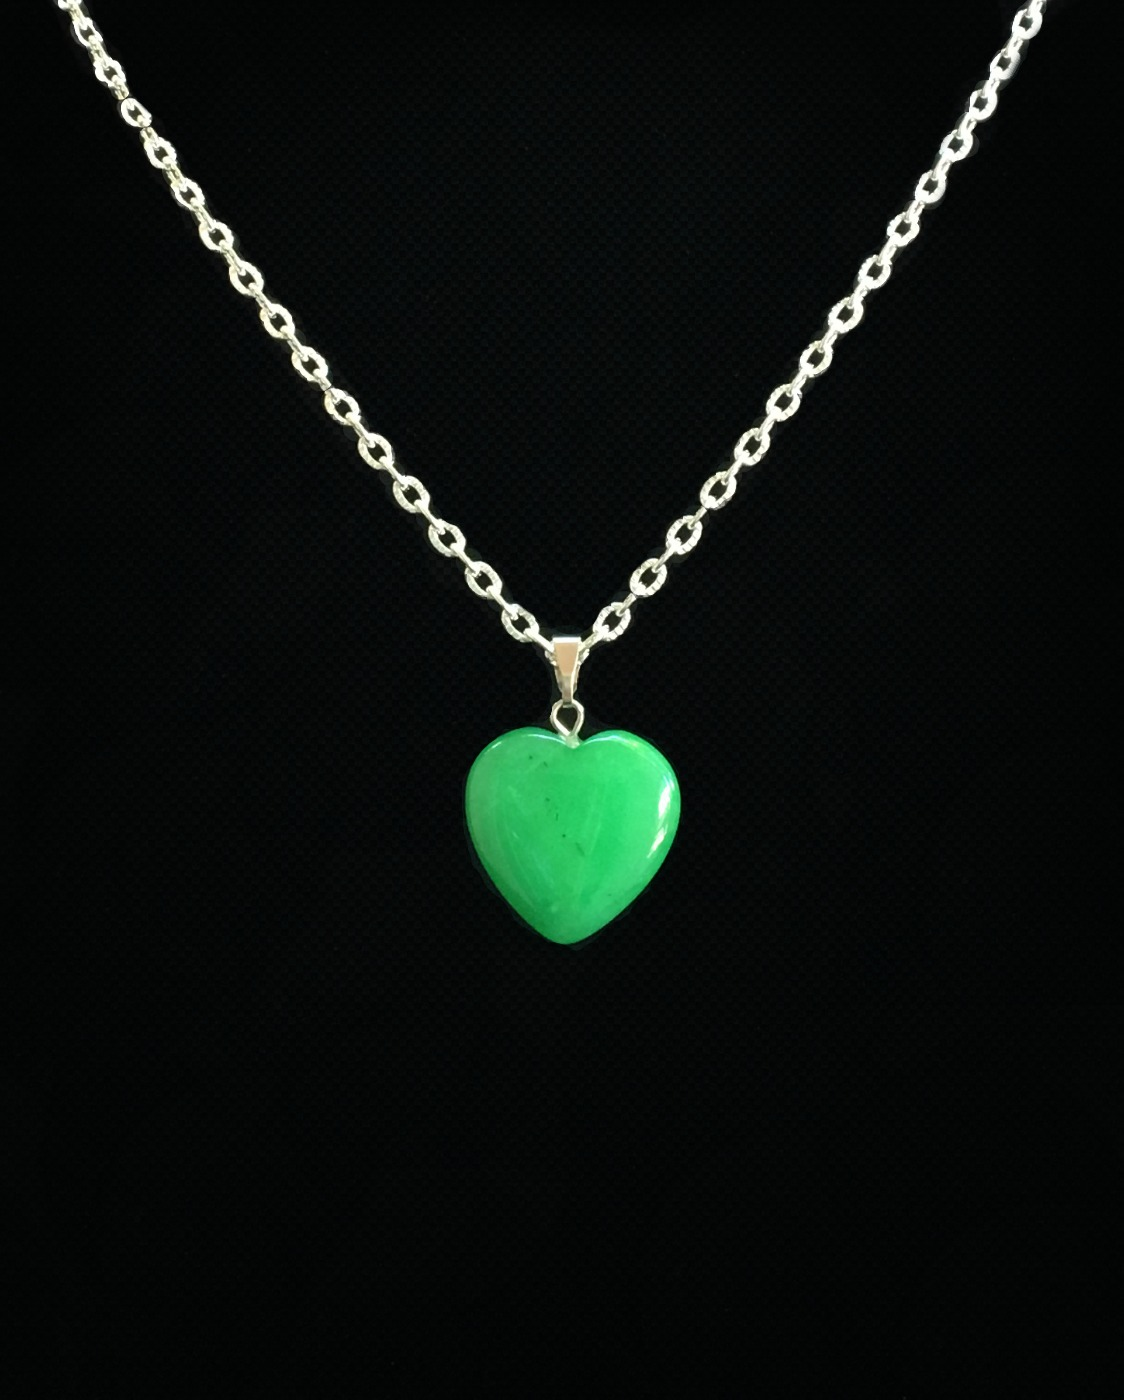 chrysoprase heart